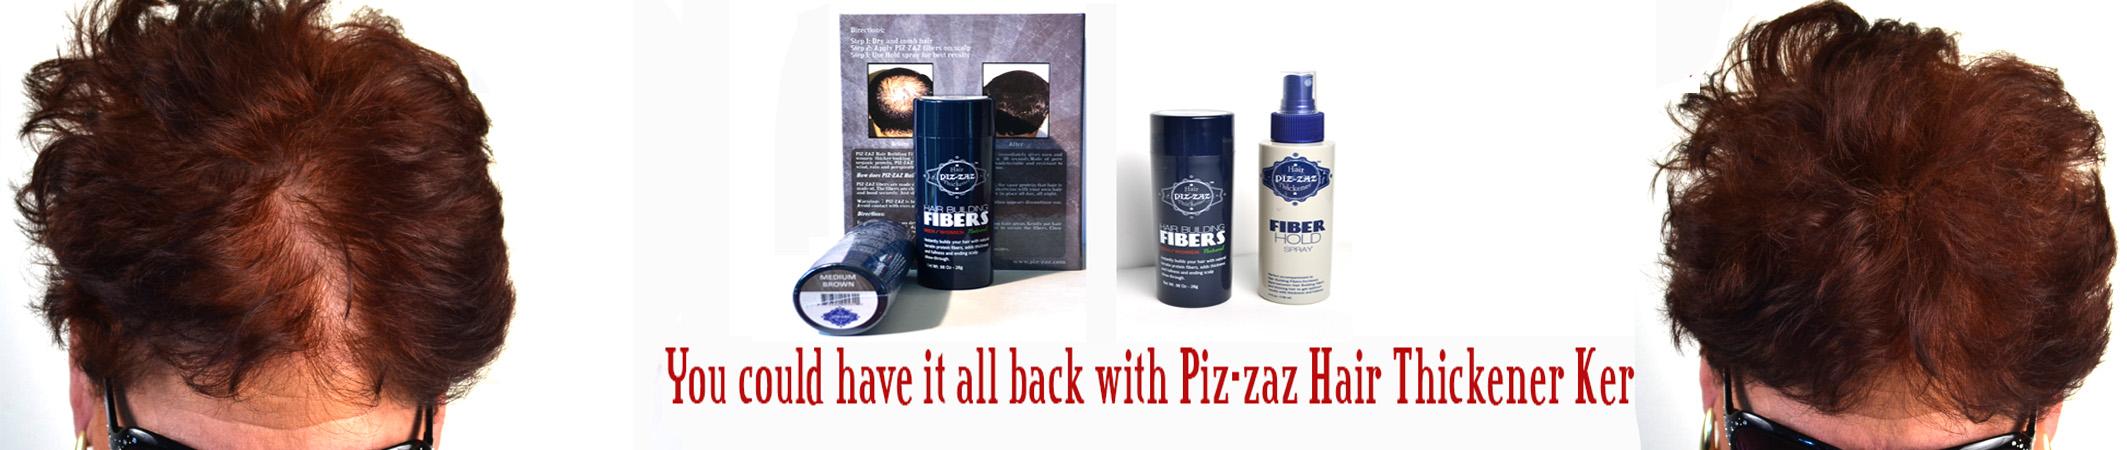 get-fuller-hair-piz-zaz-forwomen-itay-auburn-colors.jpg